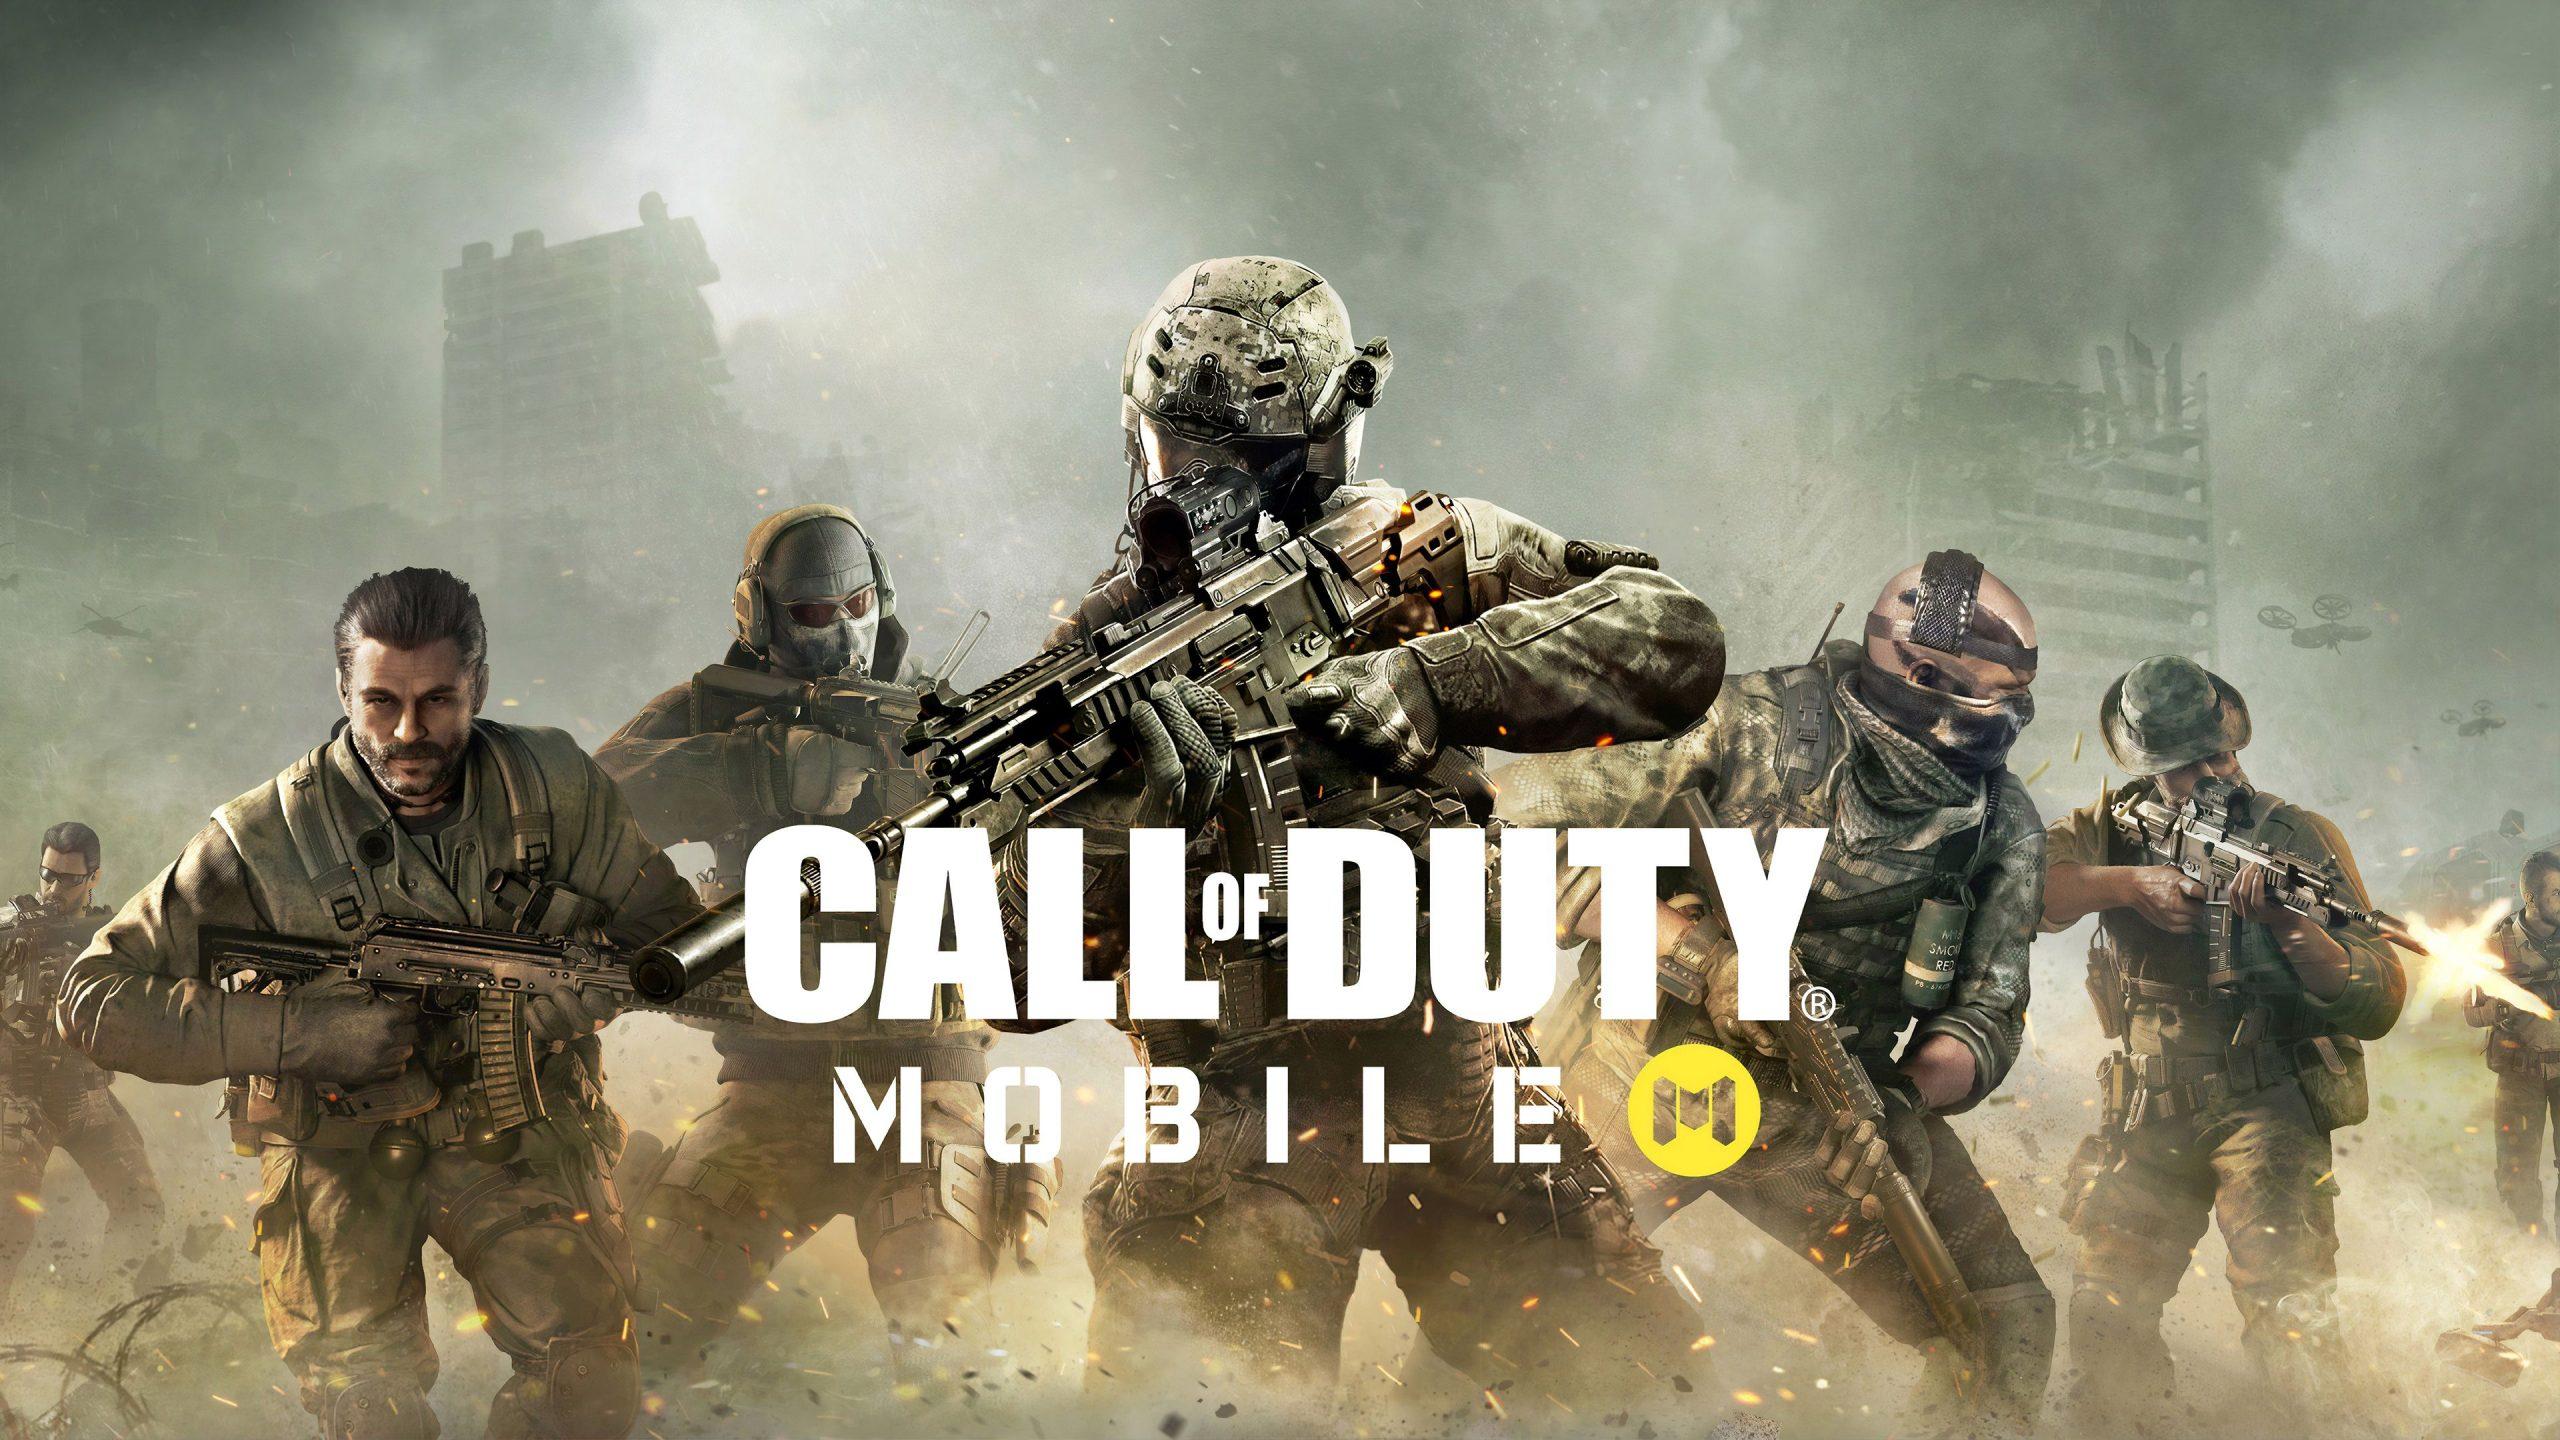 Call of Duty net worth 2021